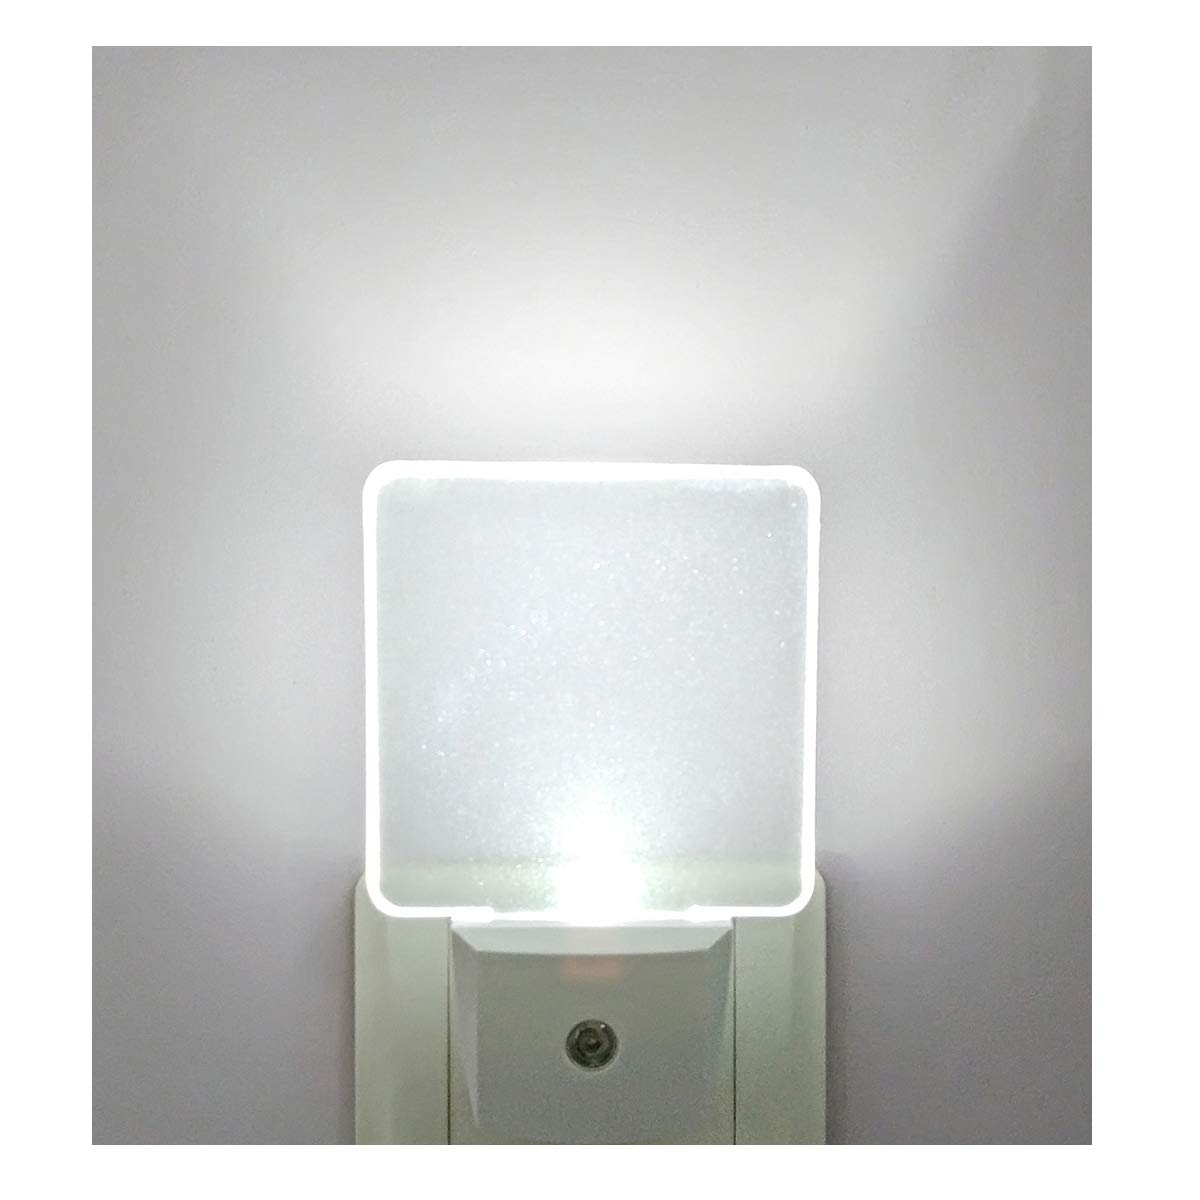 GREENIC LED Night Light,Dusk to Dawn Light Sensor,UK Plug in (Yellow, Pack of 1)